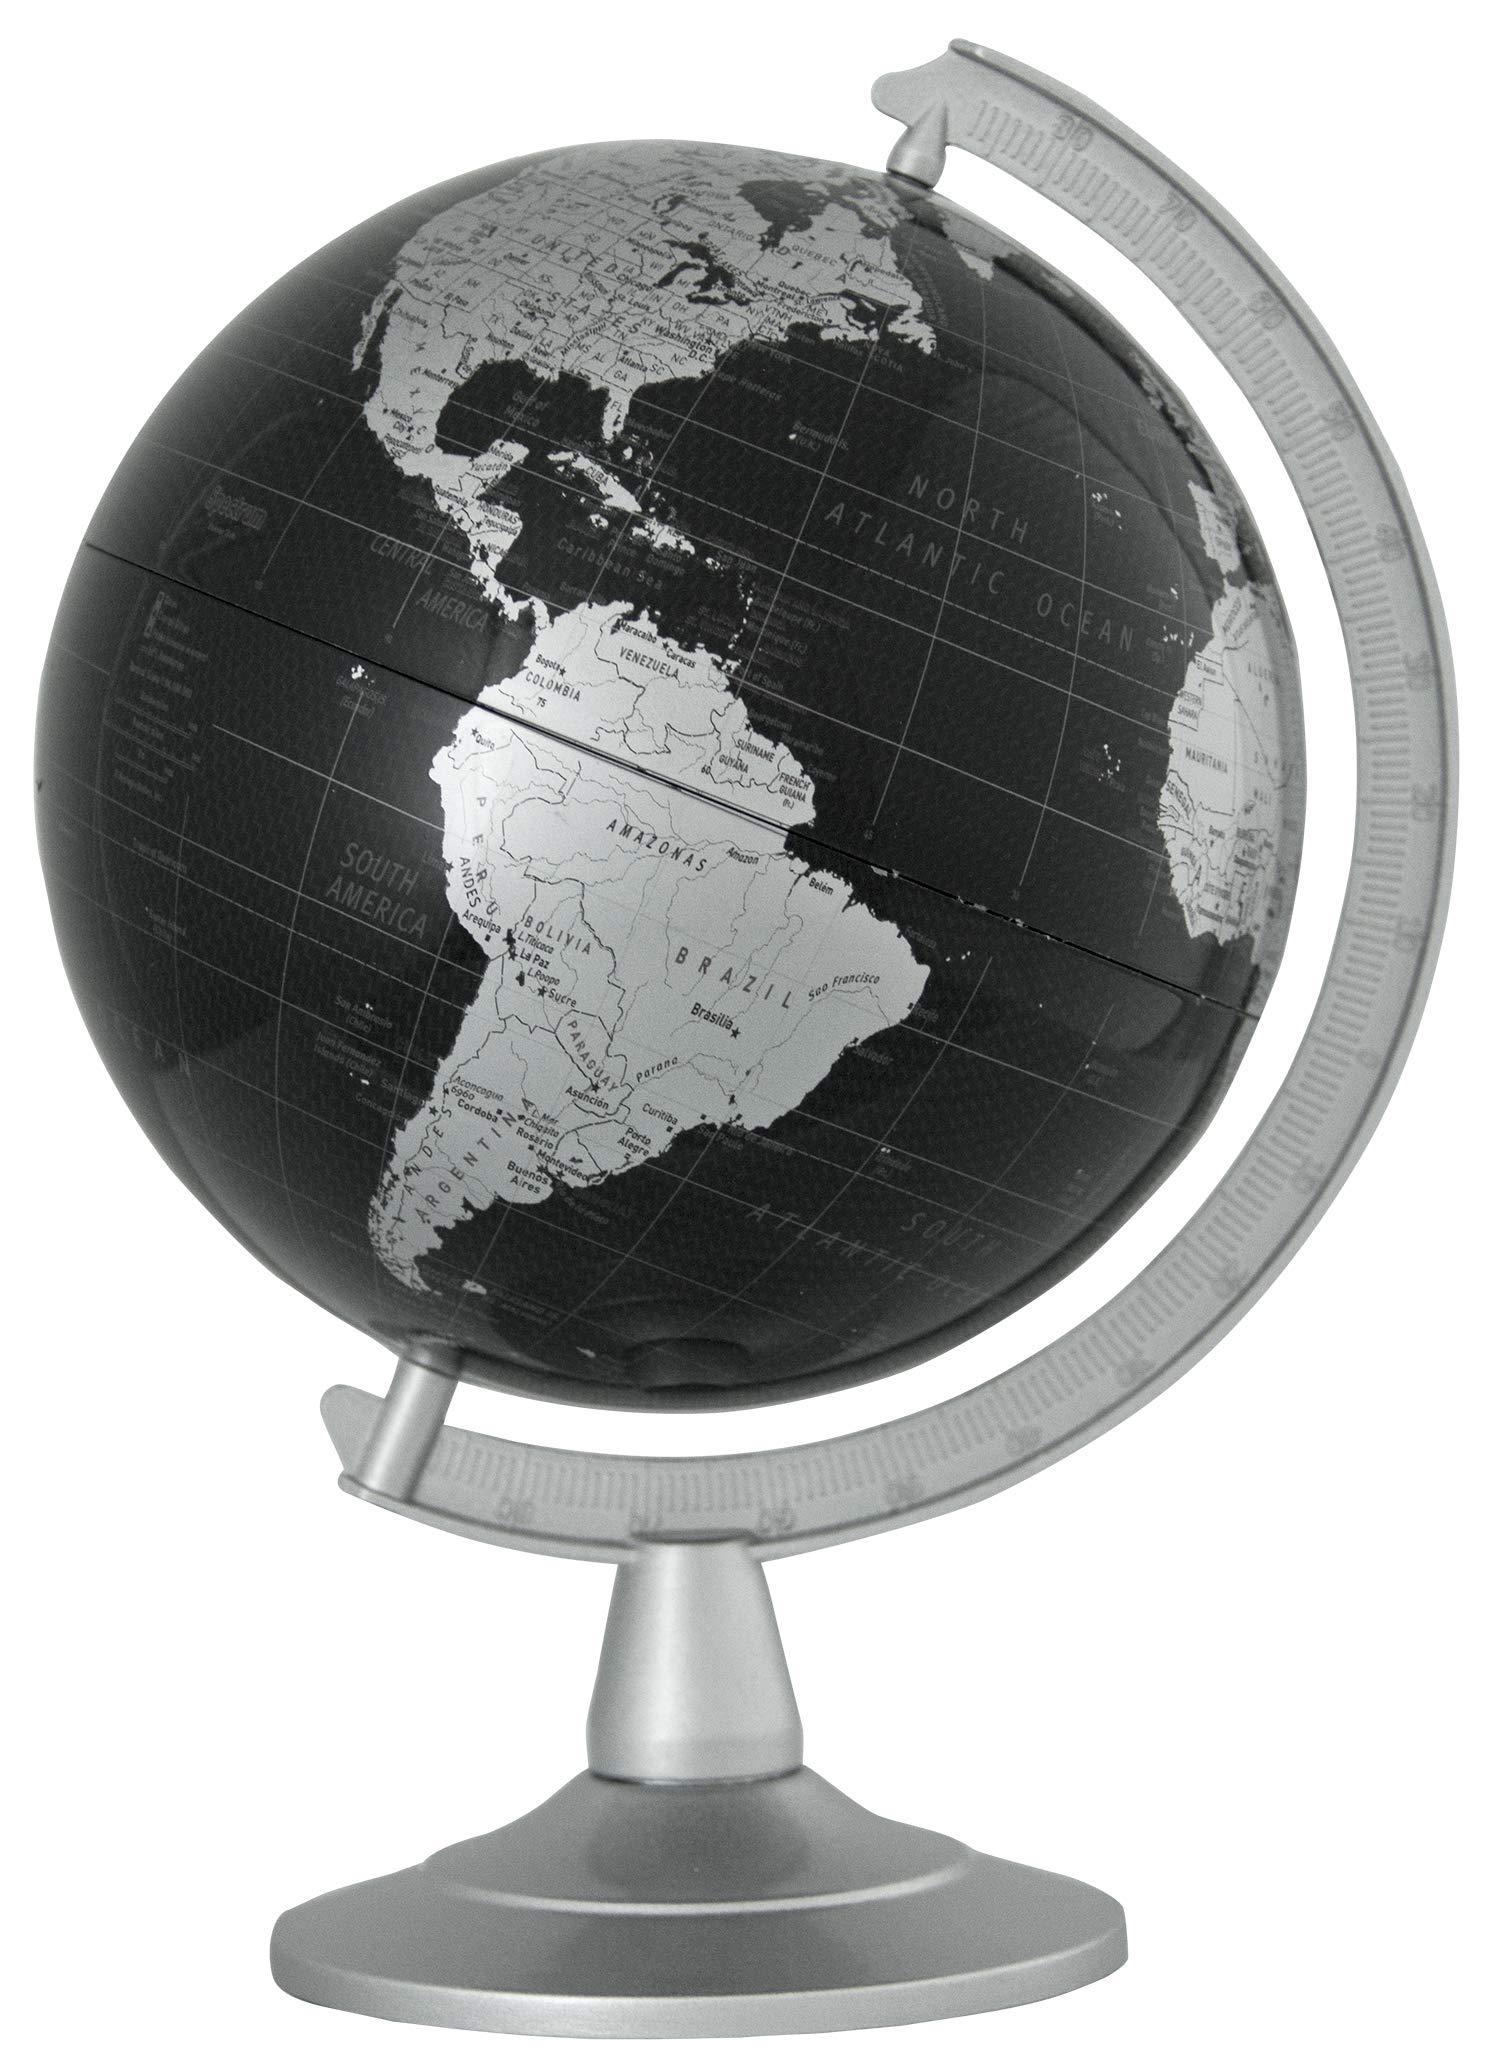 Replogle Delegate 6 inch Diameter -Modern Mini Globe Perfect for Office Desk or Student Desk